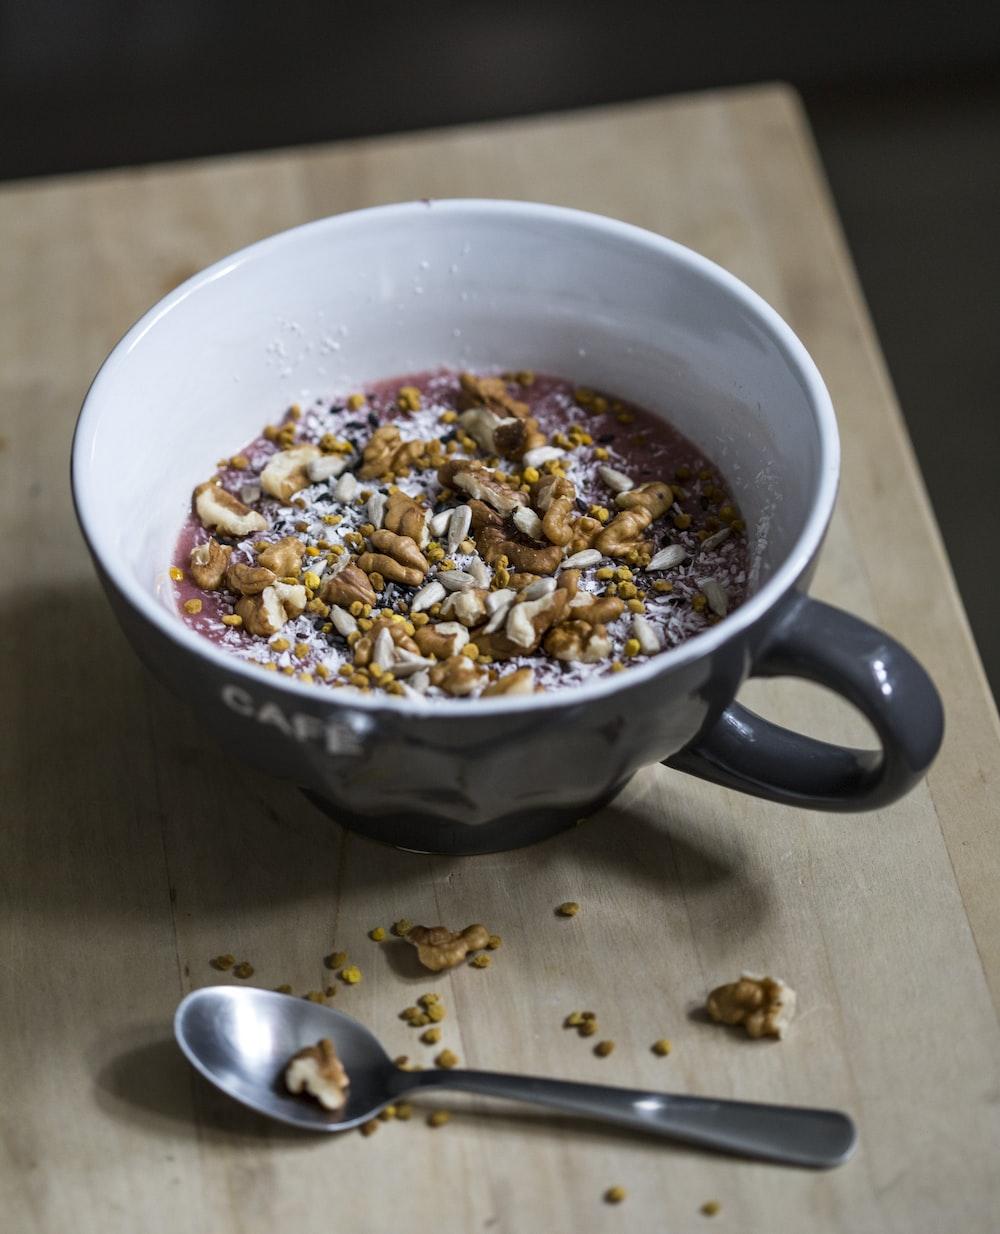 mug with cereal on table